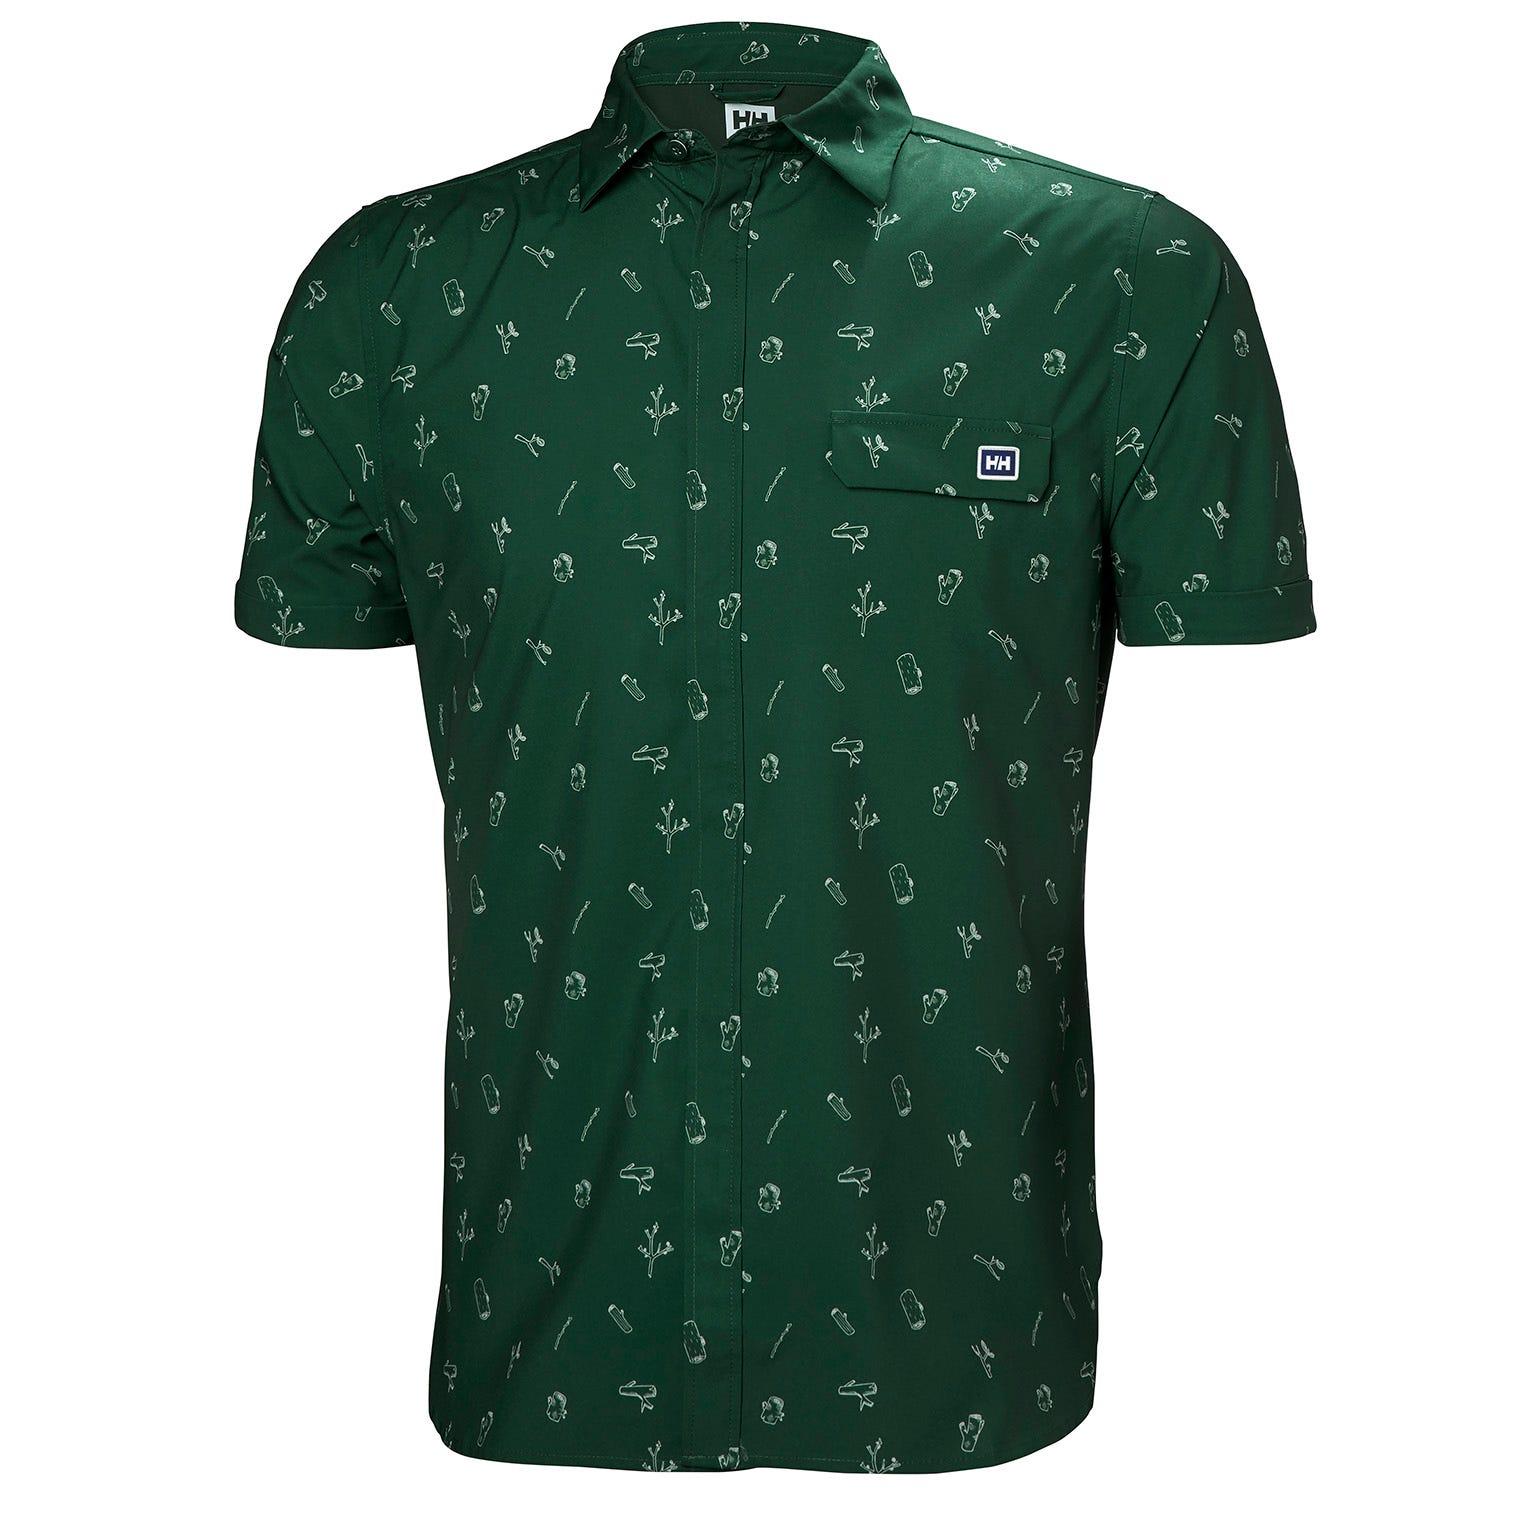 Helly Hansen Oya Shirt Green M